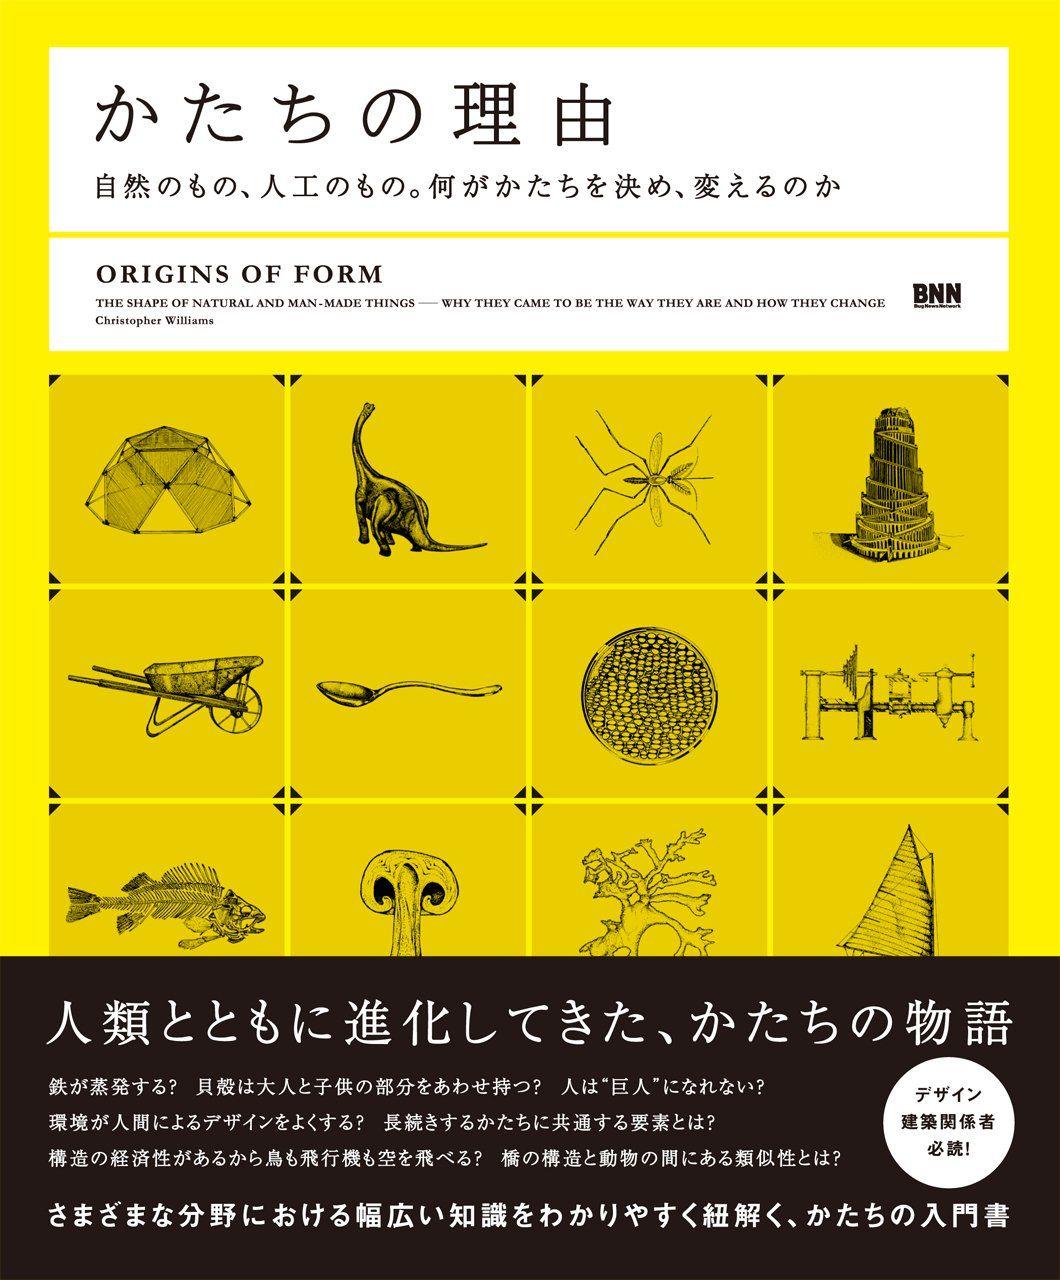 amazon co jp かたちの理由 自然のもの 人工のもの 何がかたちを決め 変えるのか クリストファー ウィリアムズ 小竹由加里 本 本 ブックデザイン マインドマップ